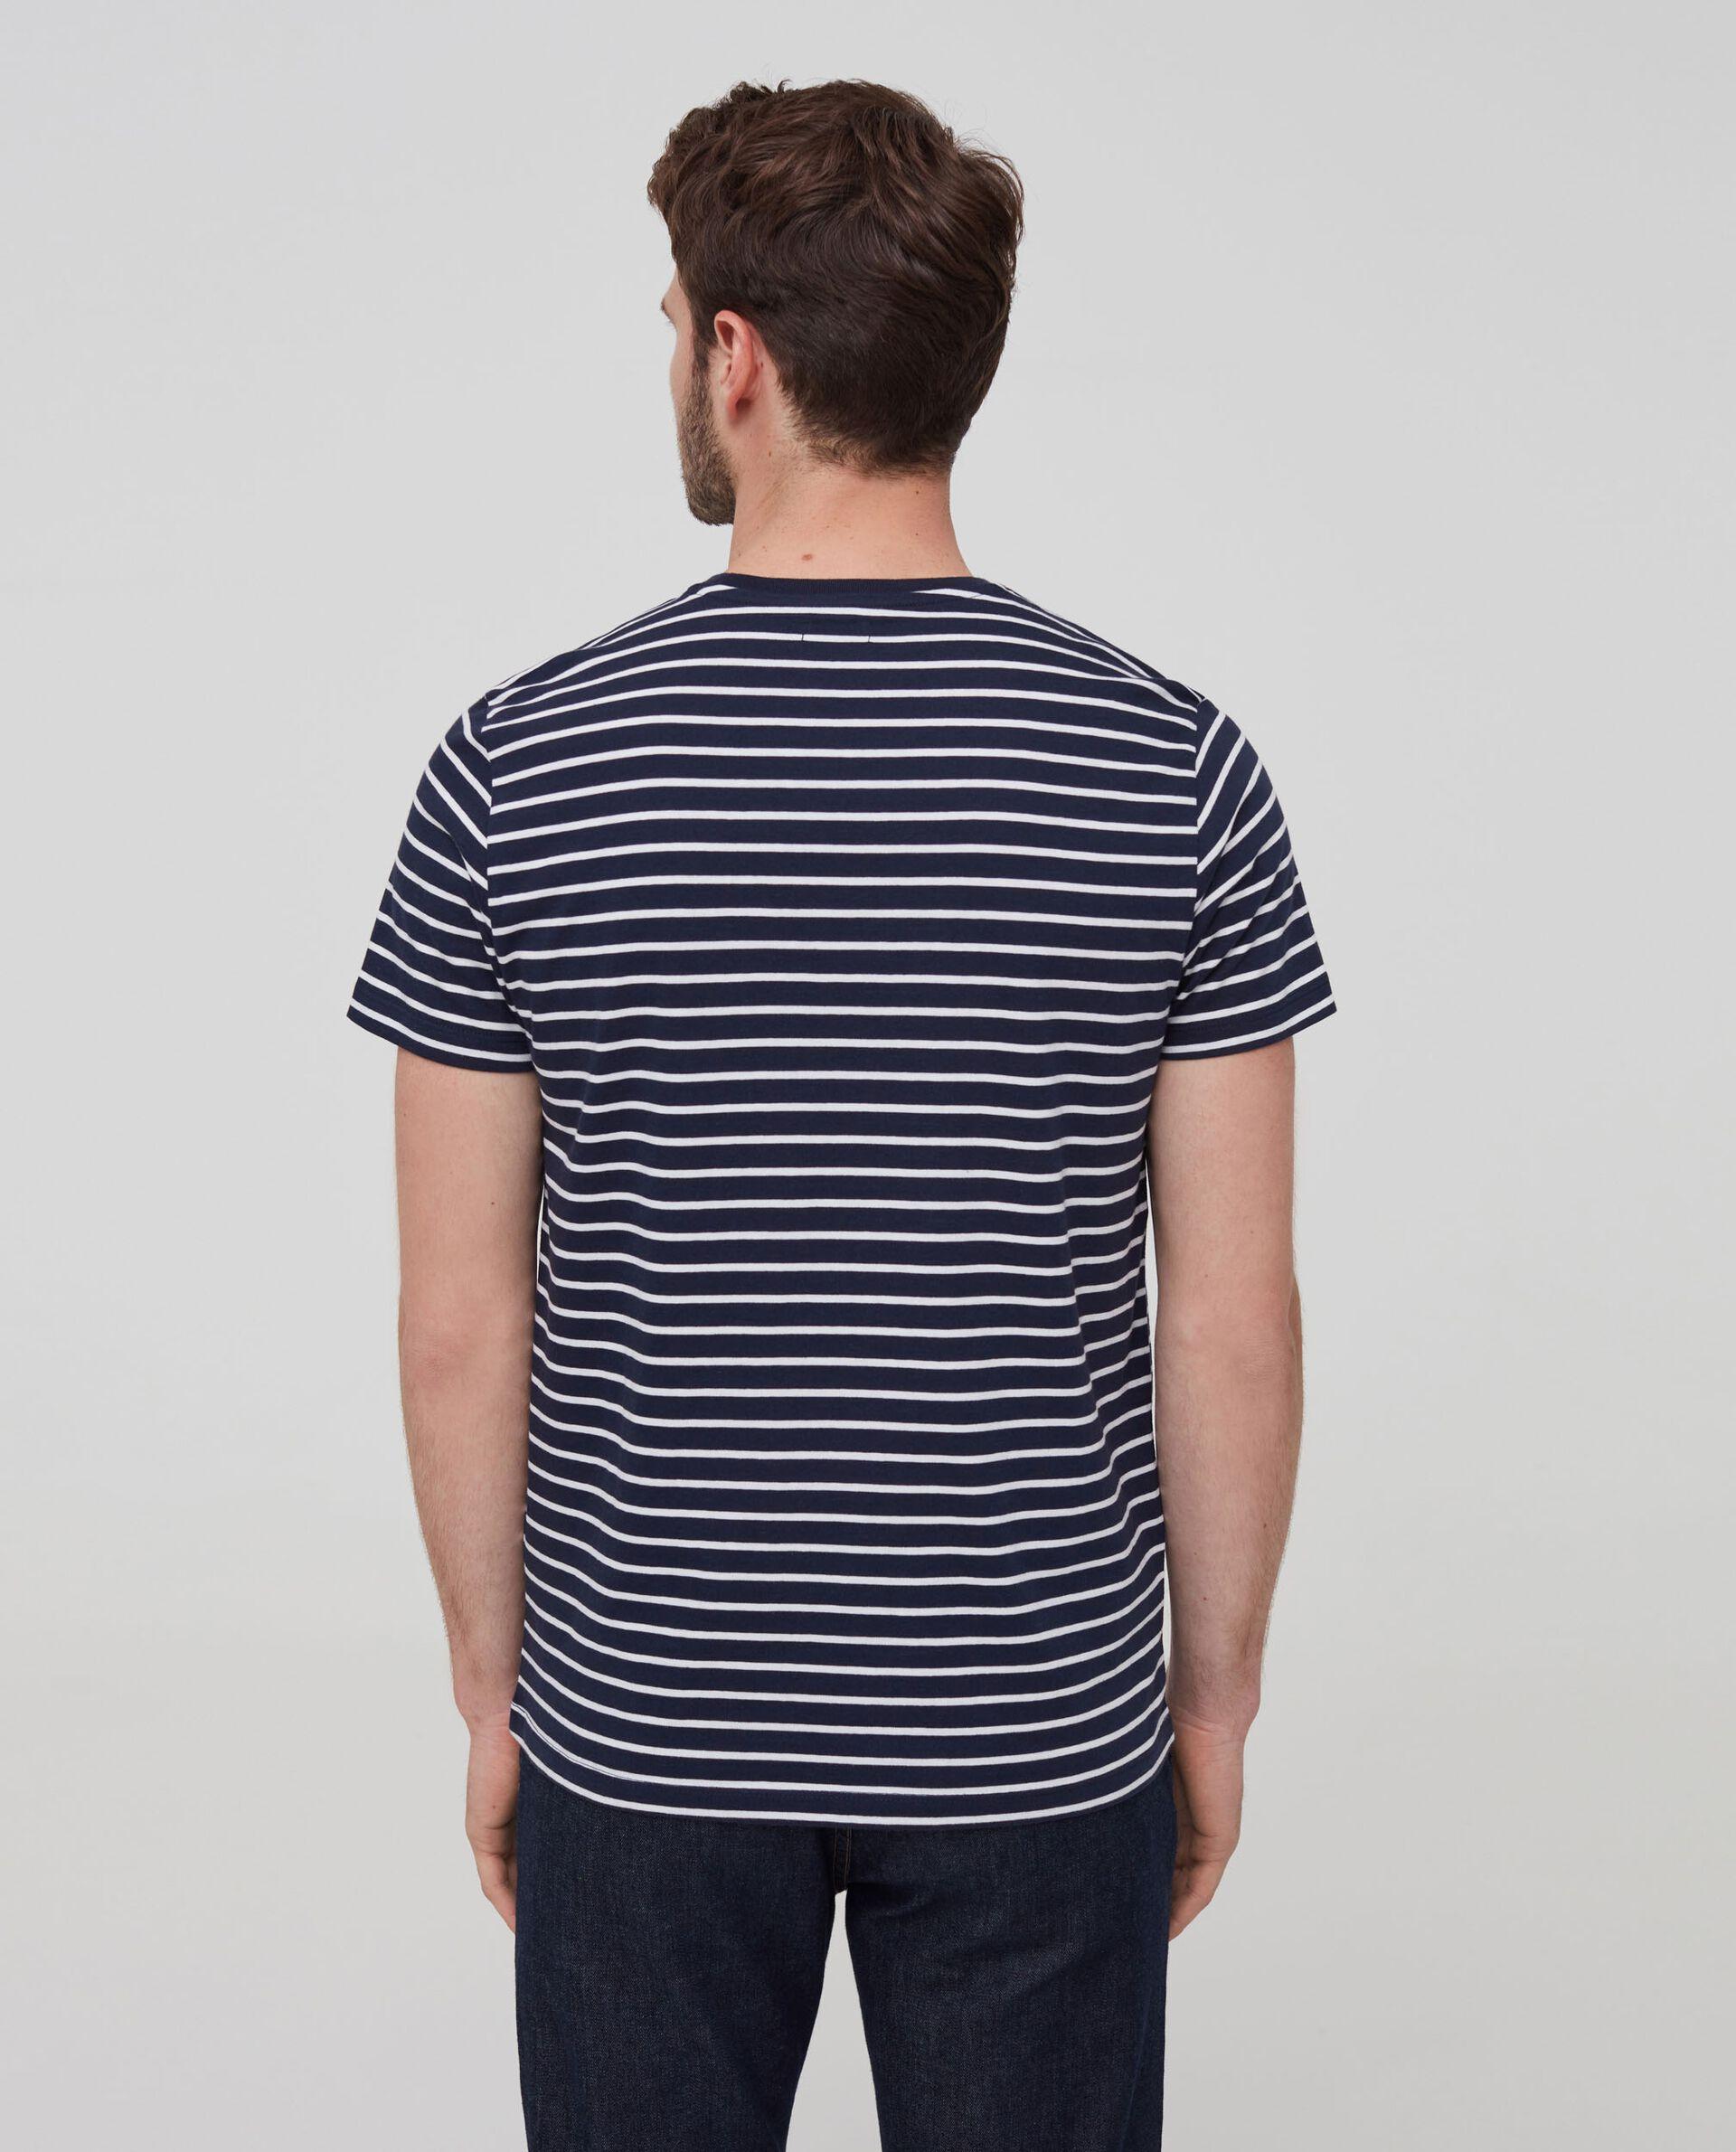 T-shirt puro cotone a righe